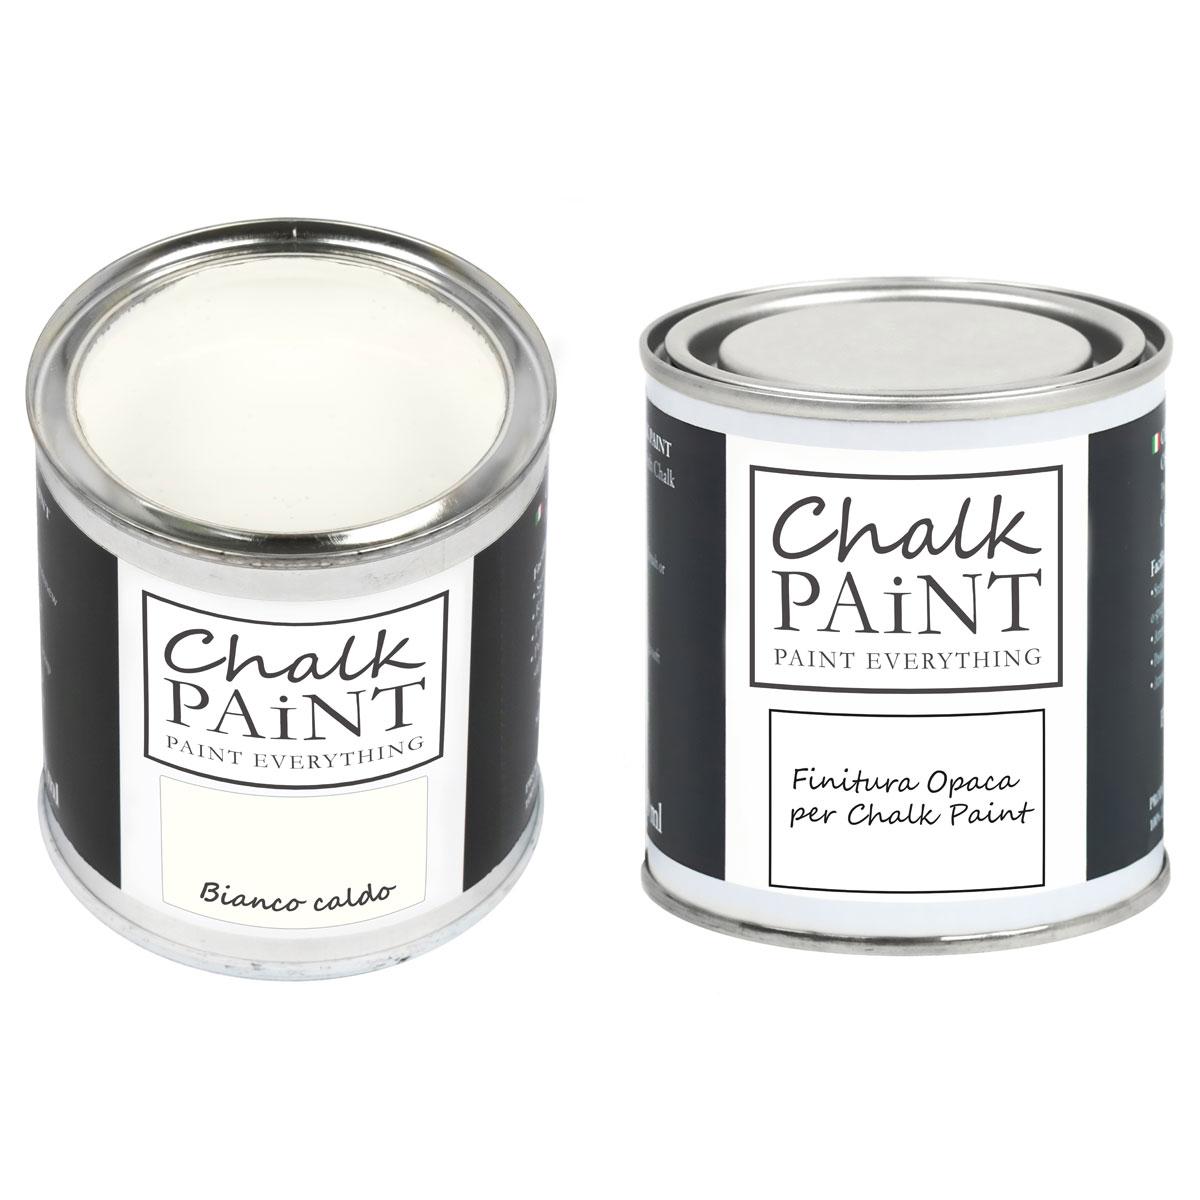 Chalk Paint Bianco Caldo decora facile